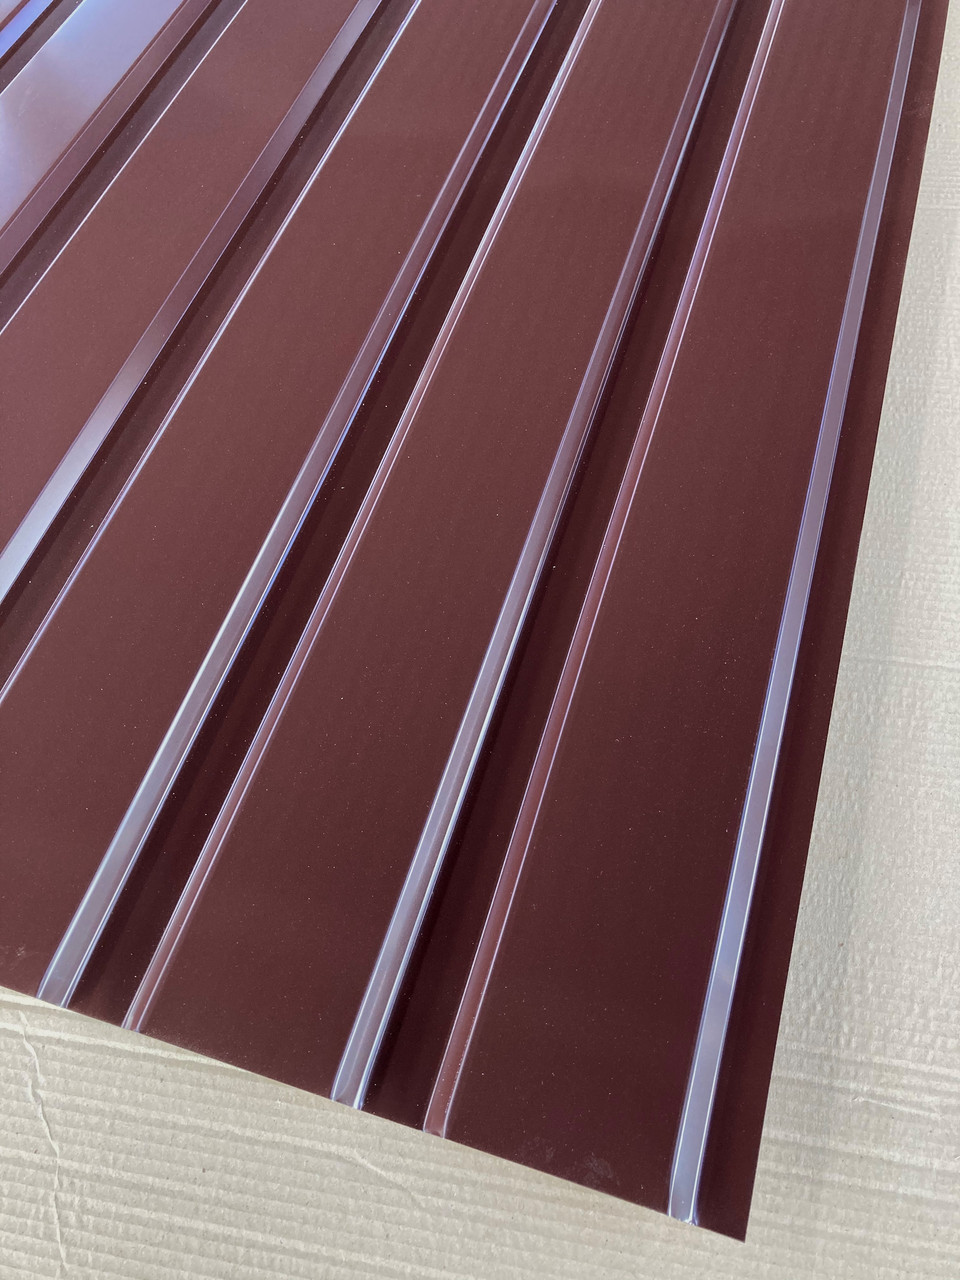 Профнастил для забора шоколад ПС-20, 0,45 мм; высота 2 метра ширина 1,16 м